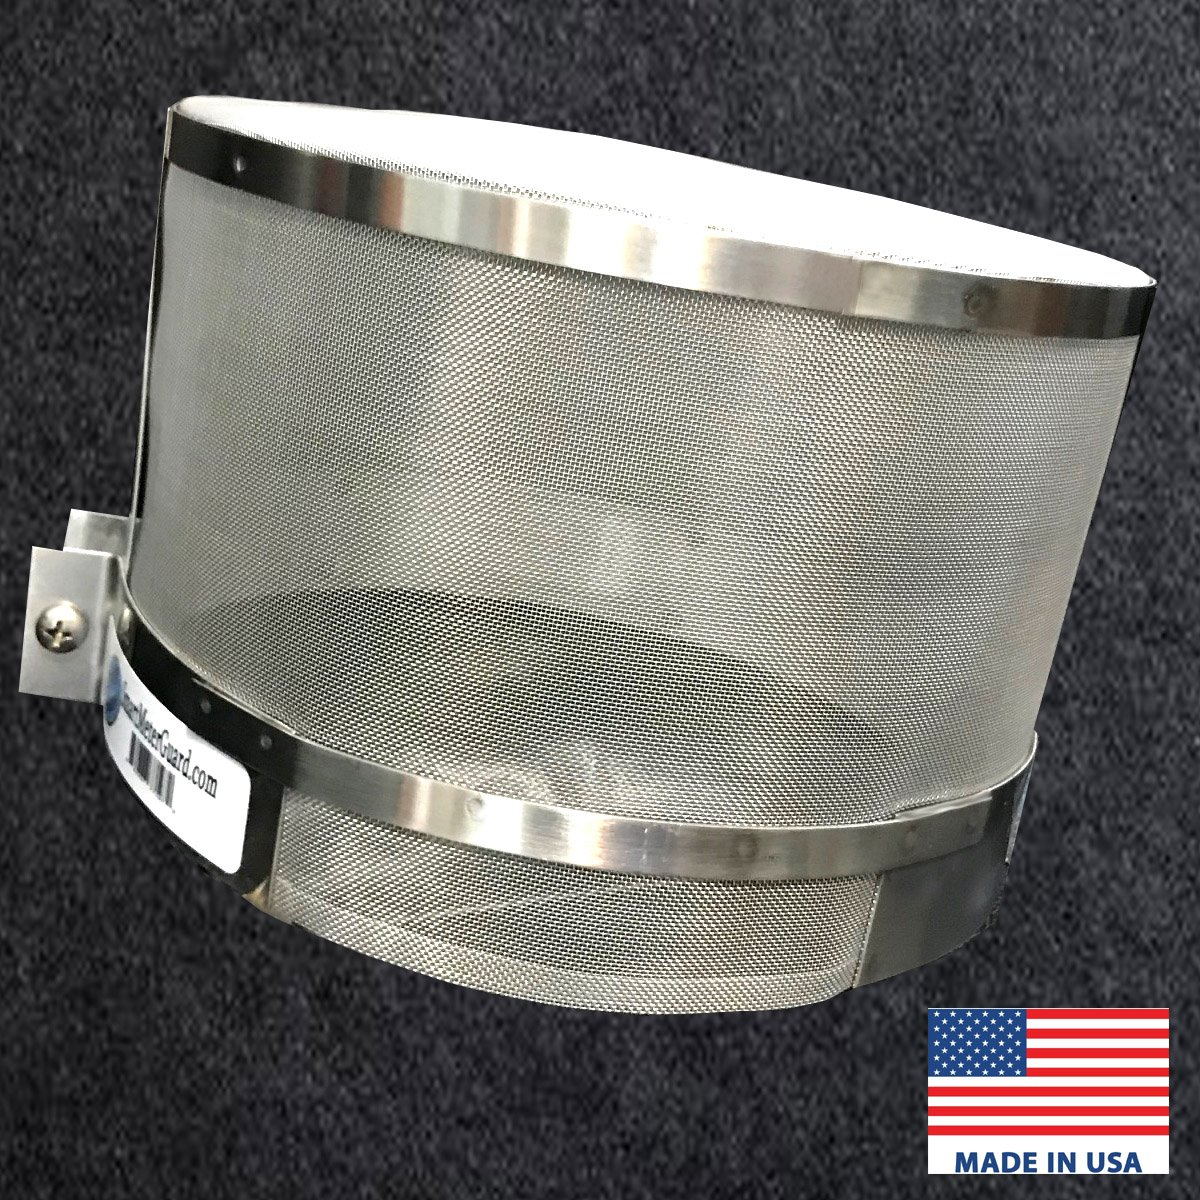 Smart Meter Guard RF Radiation Shield Cover